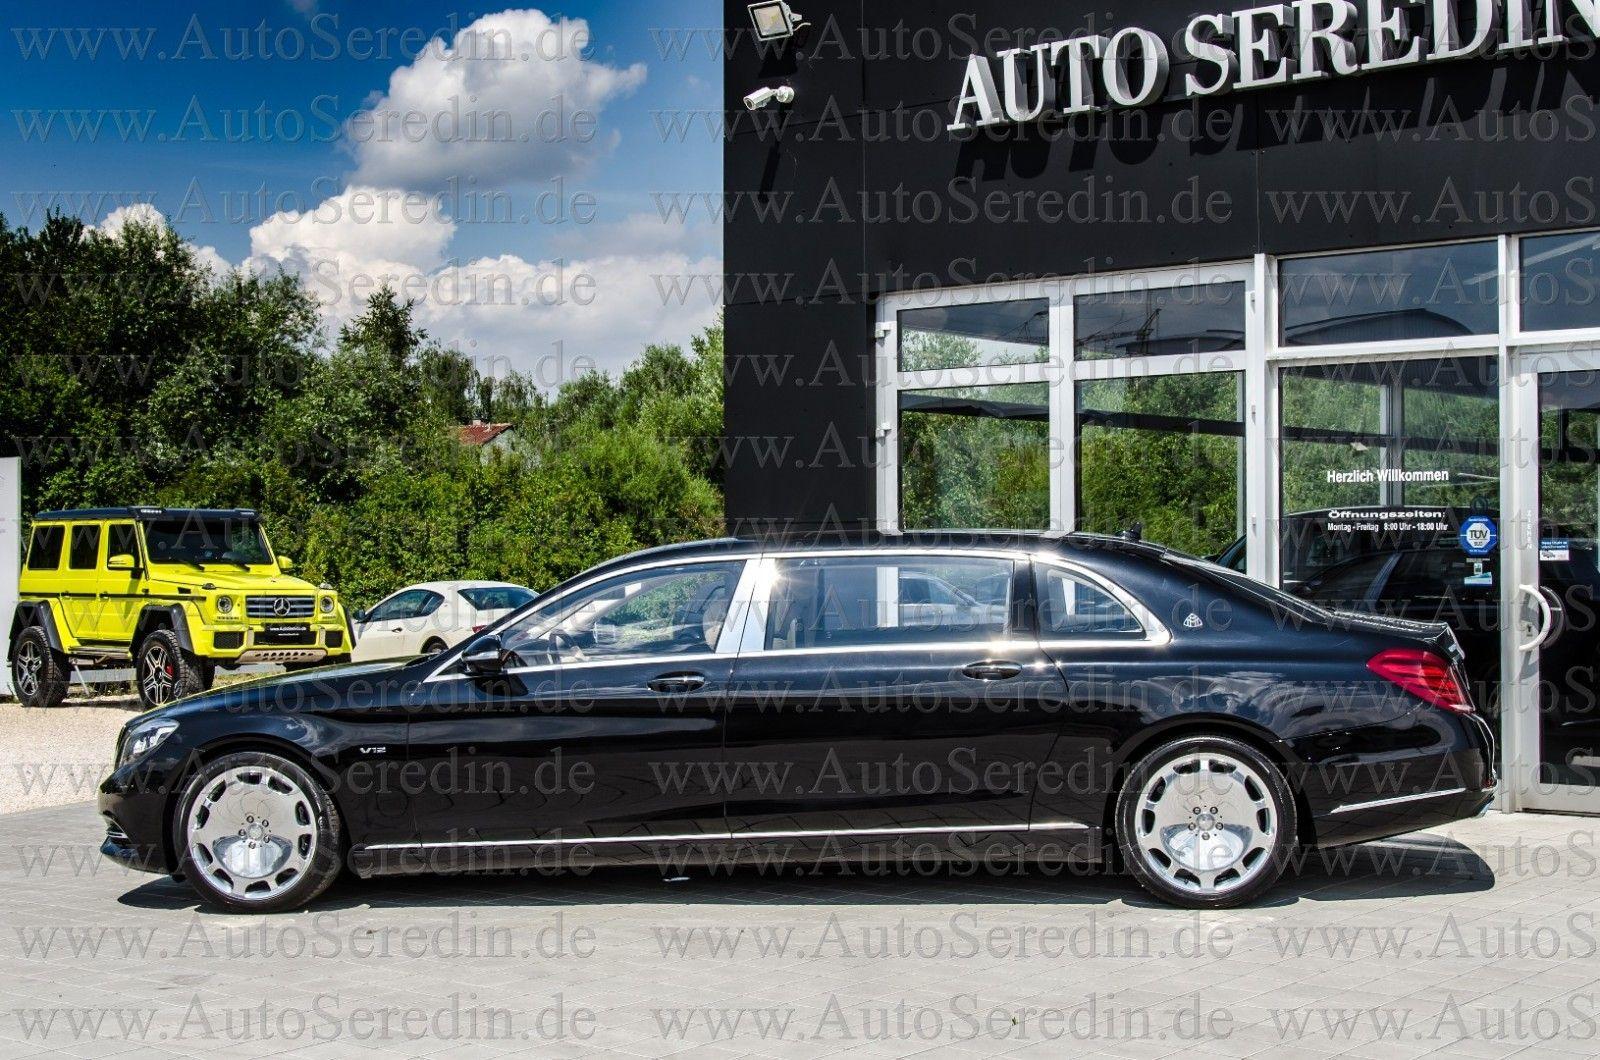 2018 Mercedes BenzMaybach S600 (W222) Stretch Limousine